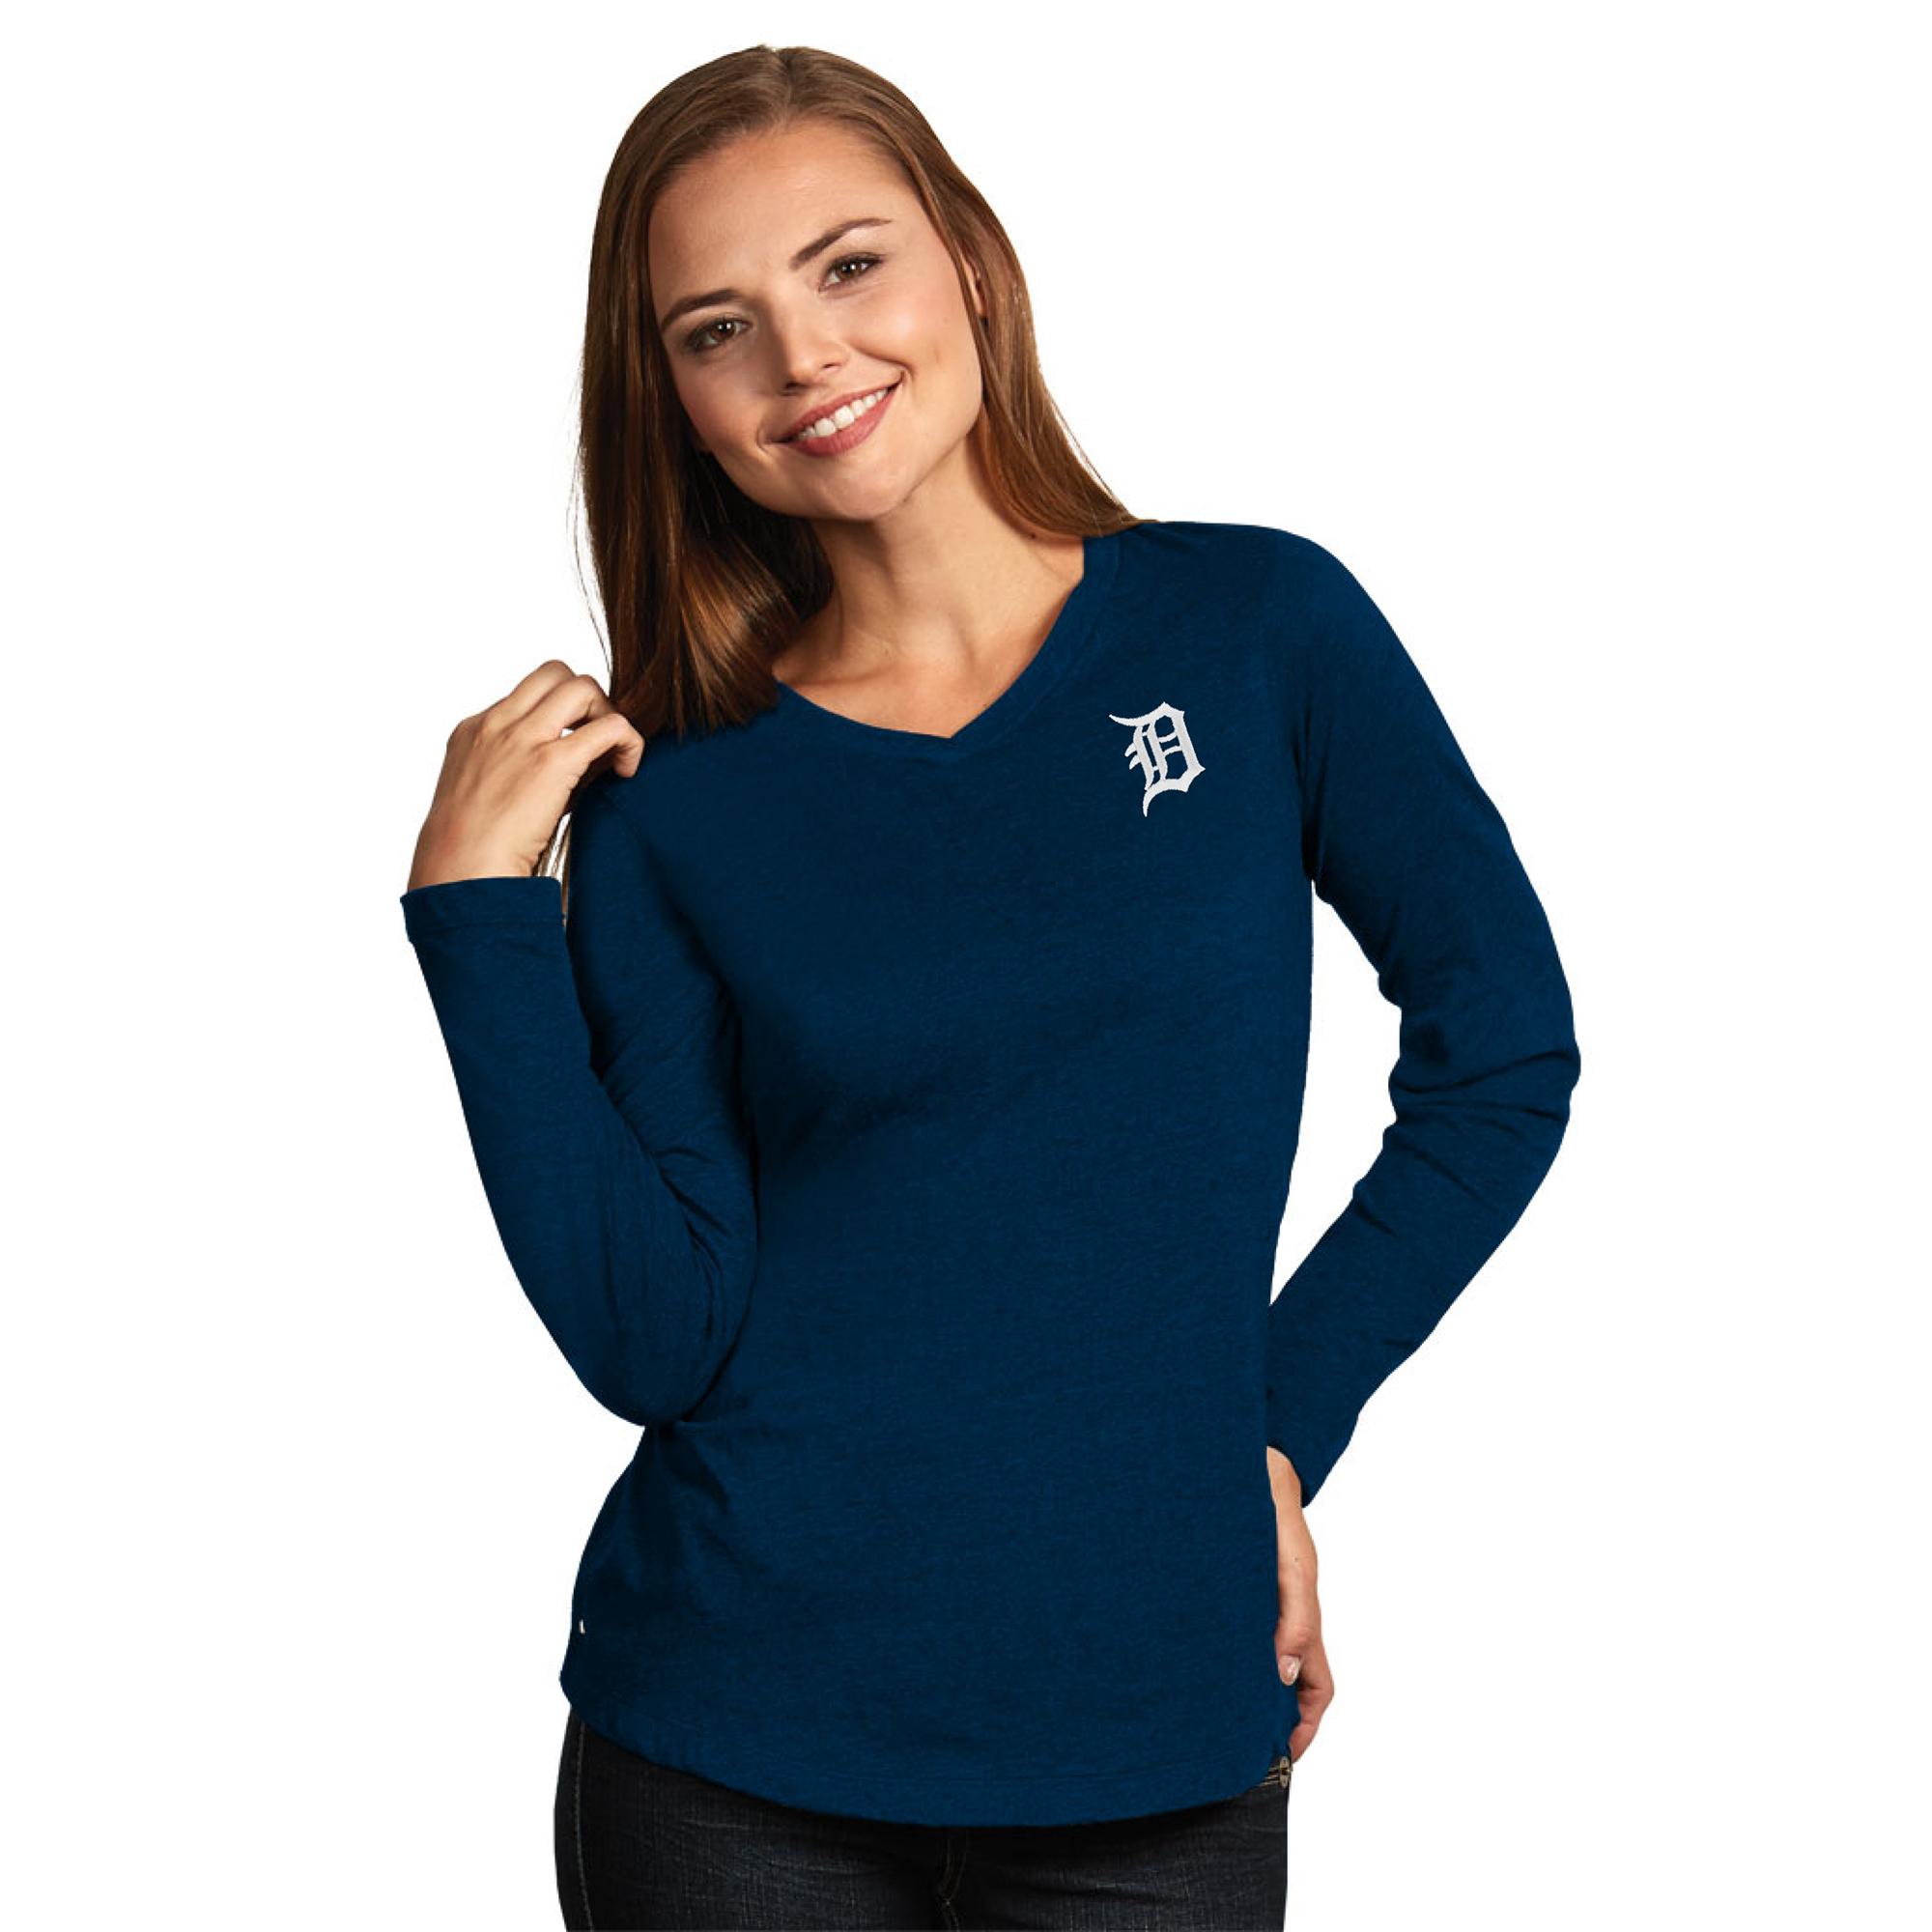 Detroit Tigers Antigua Women's Flip Long Sleeve T-Shirt - Heather Navy